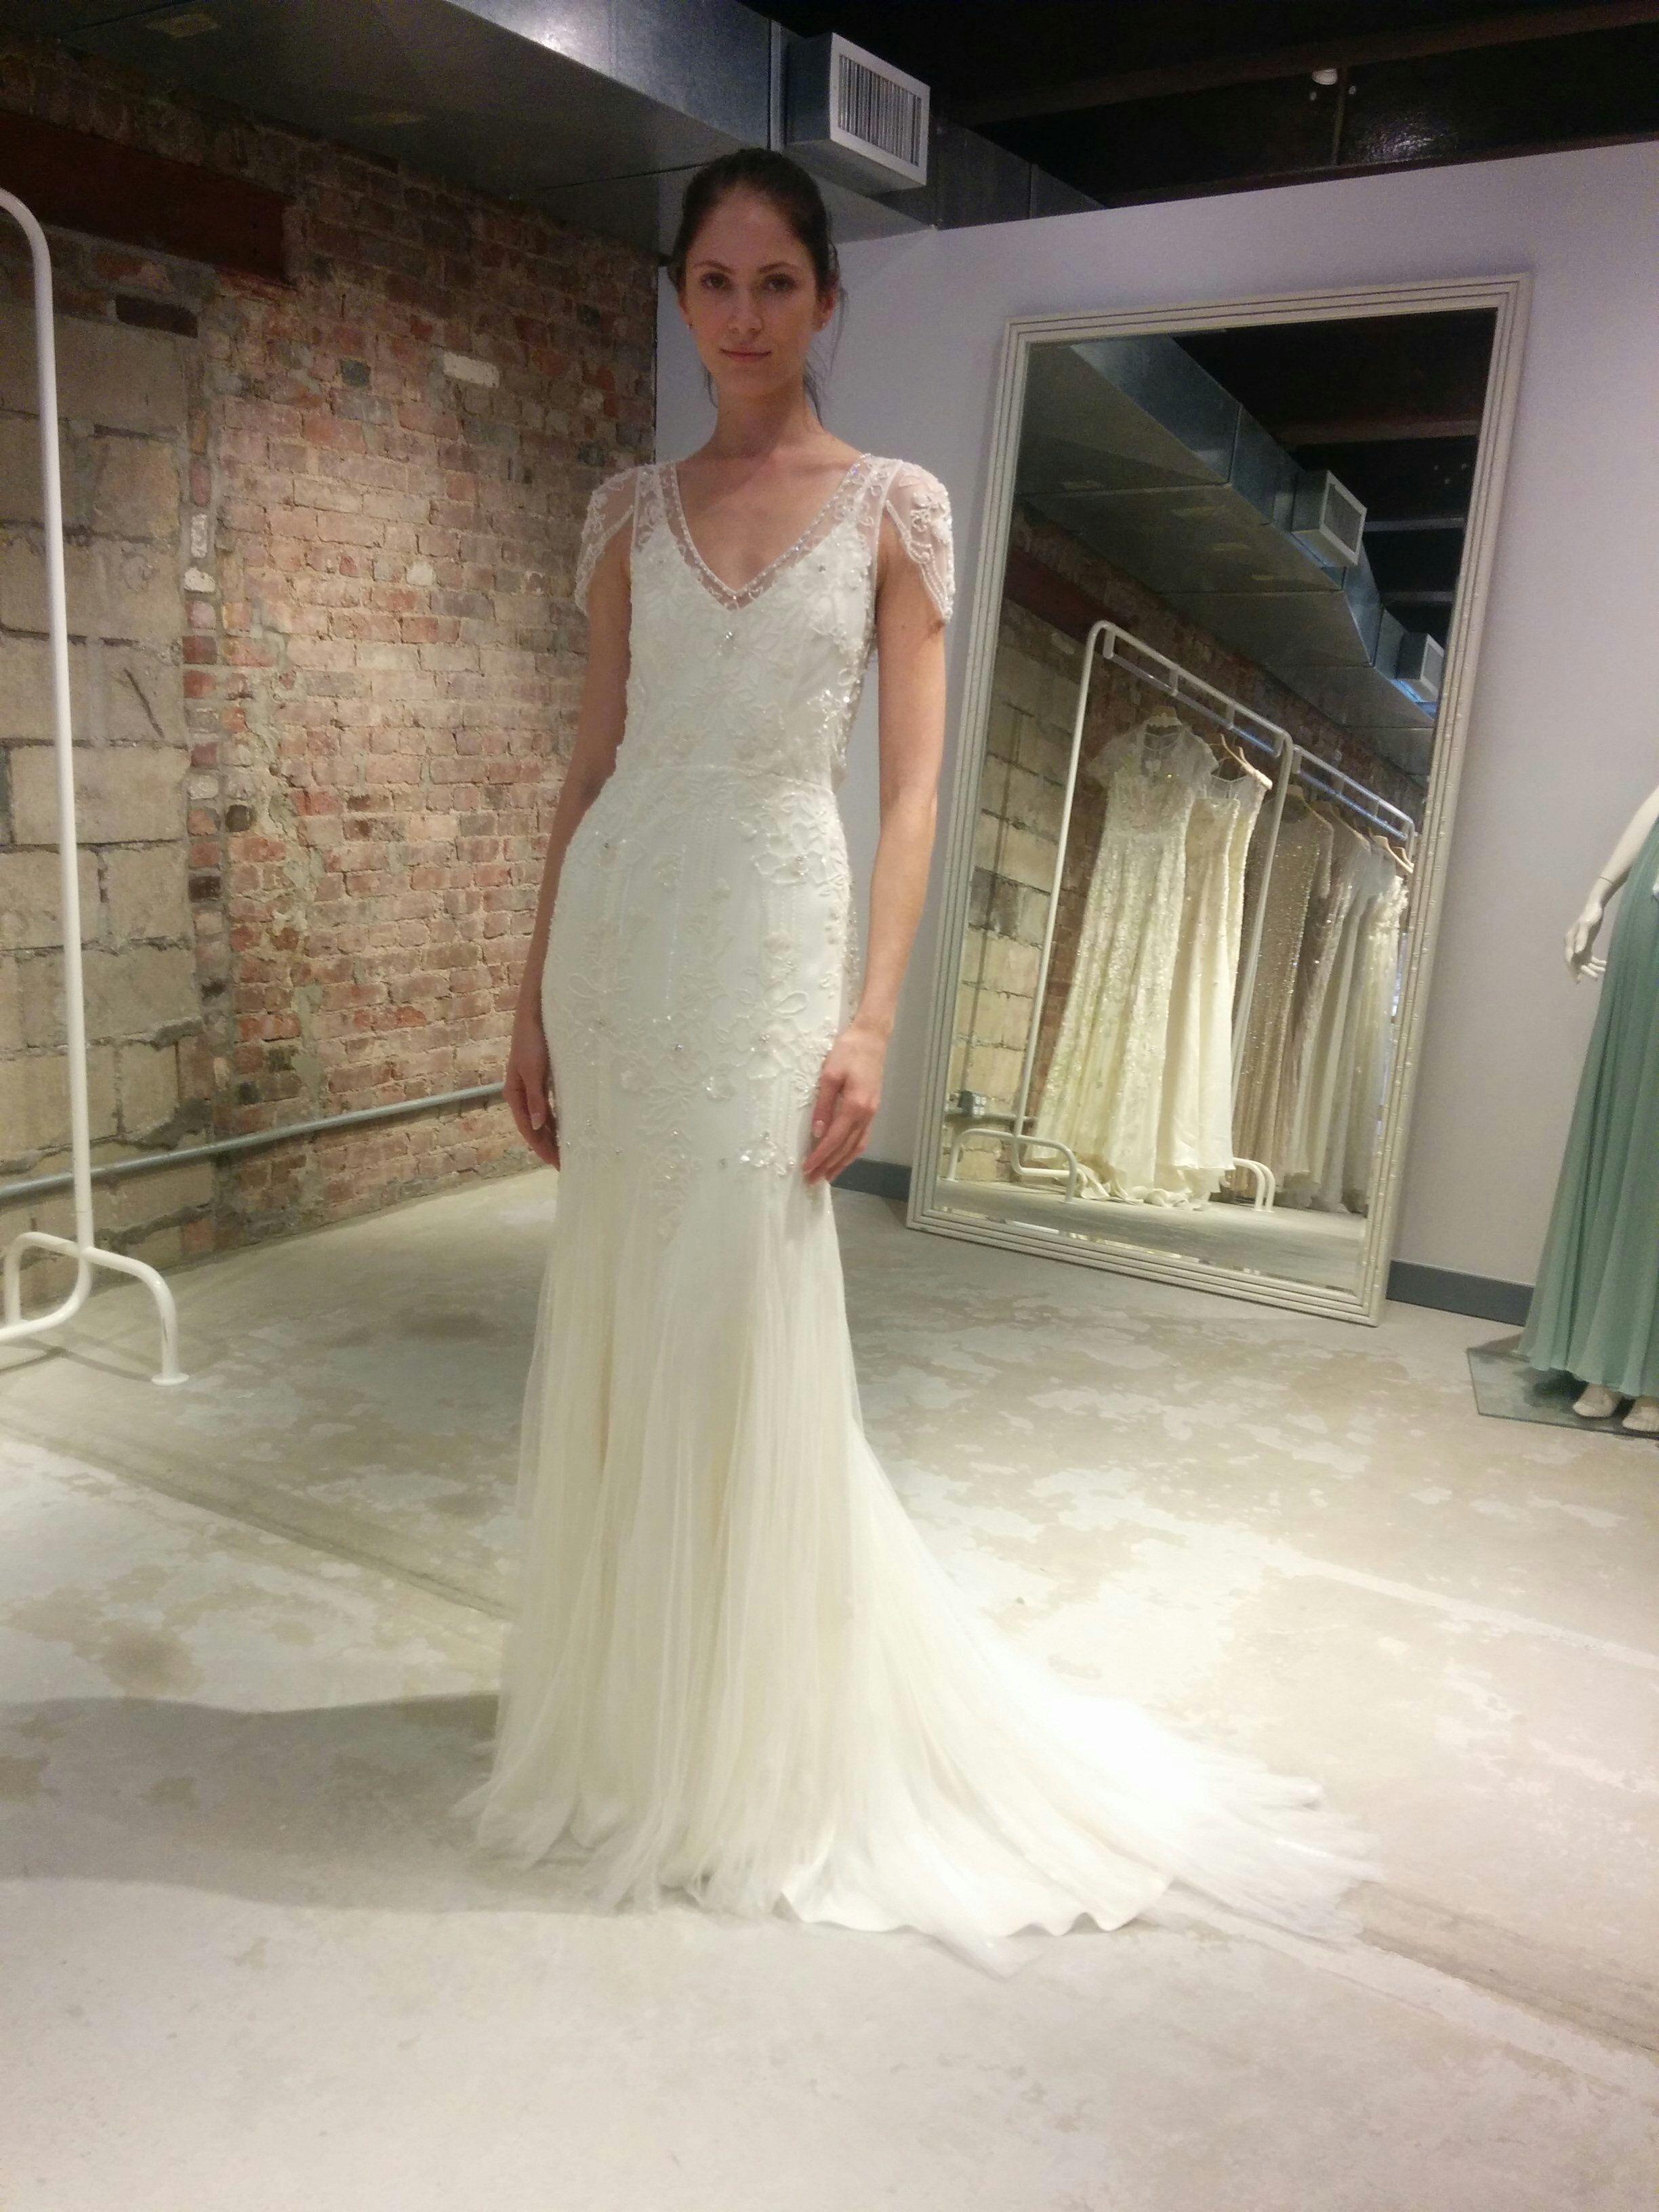 31b5d9d7cce49 2016 Mariana Dress in Ivory by UK designer Jenny Packham | I do ...